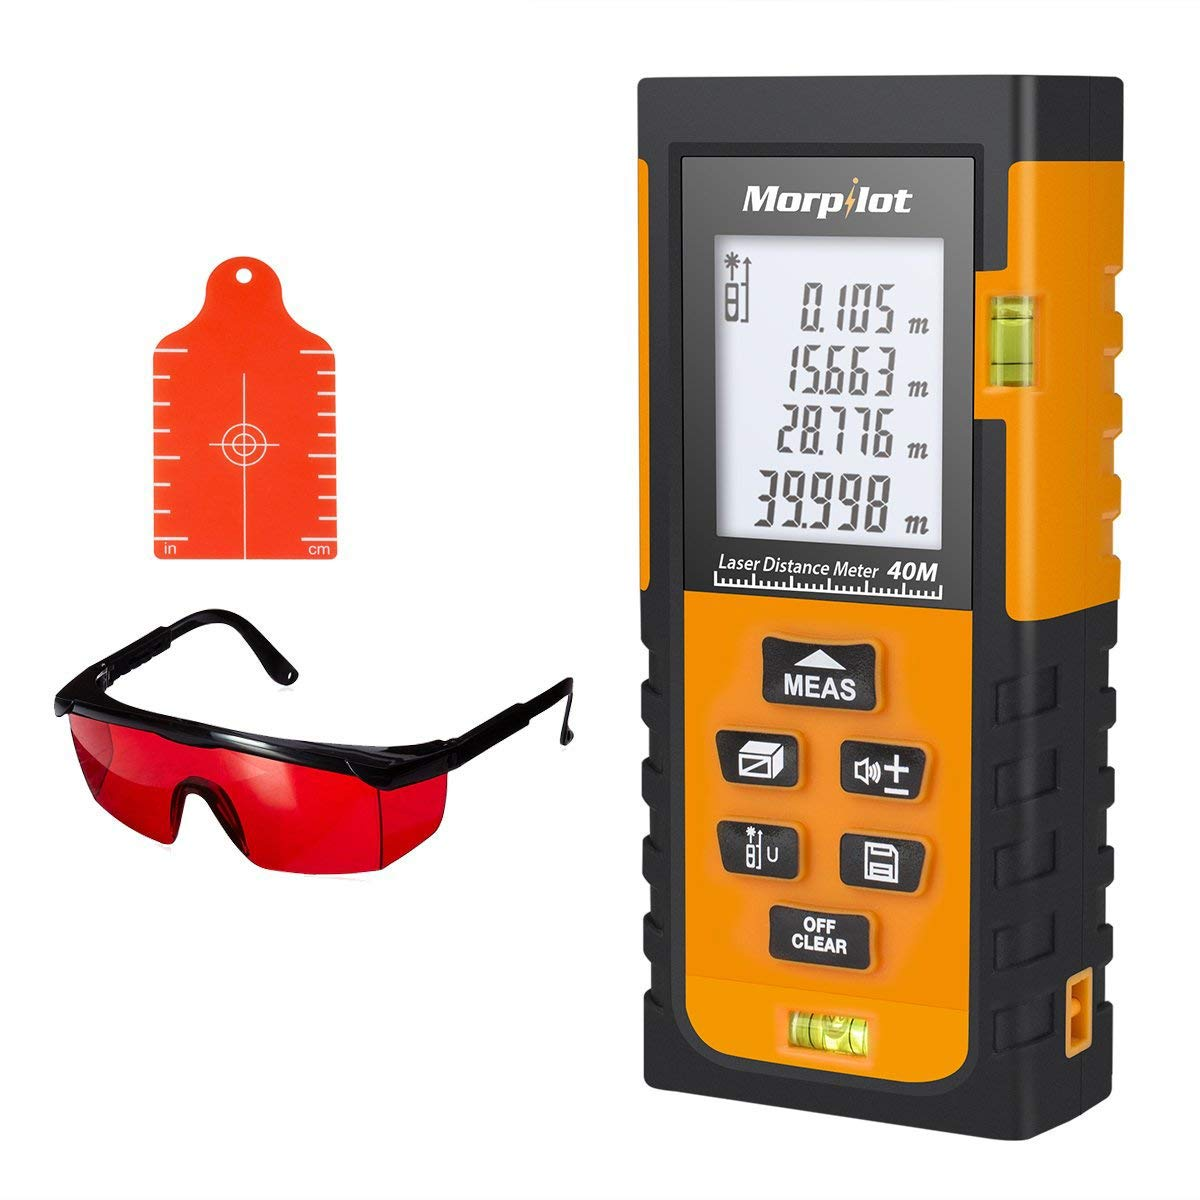 131ft Laser Measure - Morpilot Laser Tape Measure with Target Plate & Enhancing Glasses, Laser Measuring Device with Pythagorean Mode, Measure Distance, Area, Volume Calculation